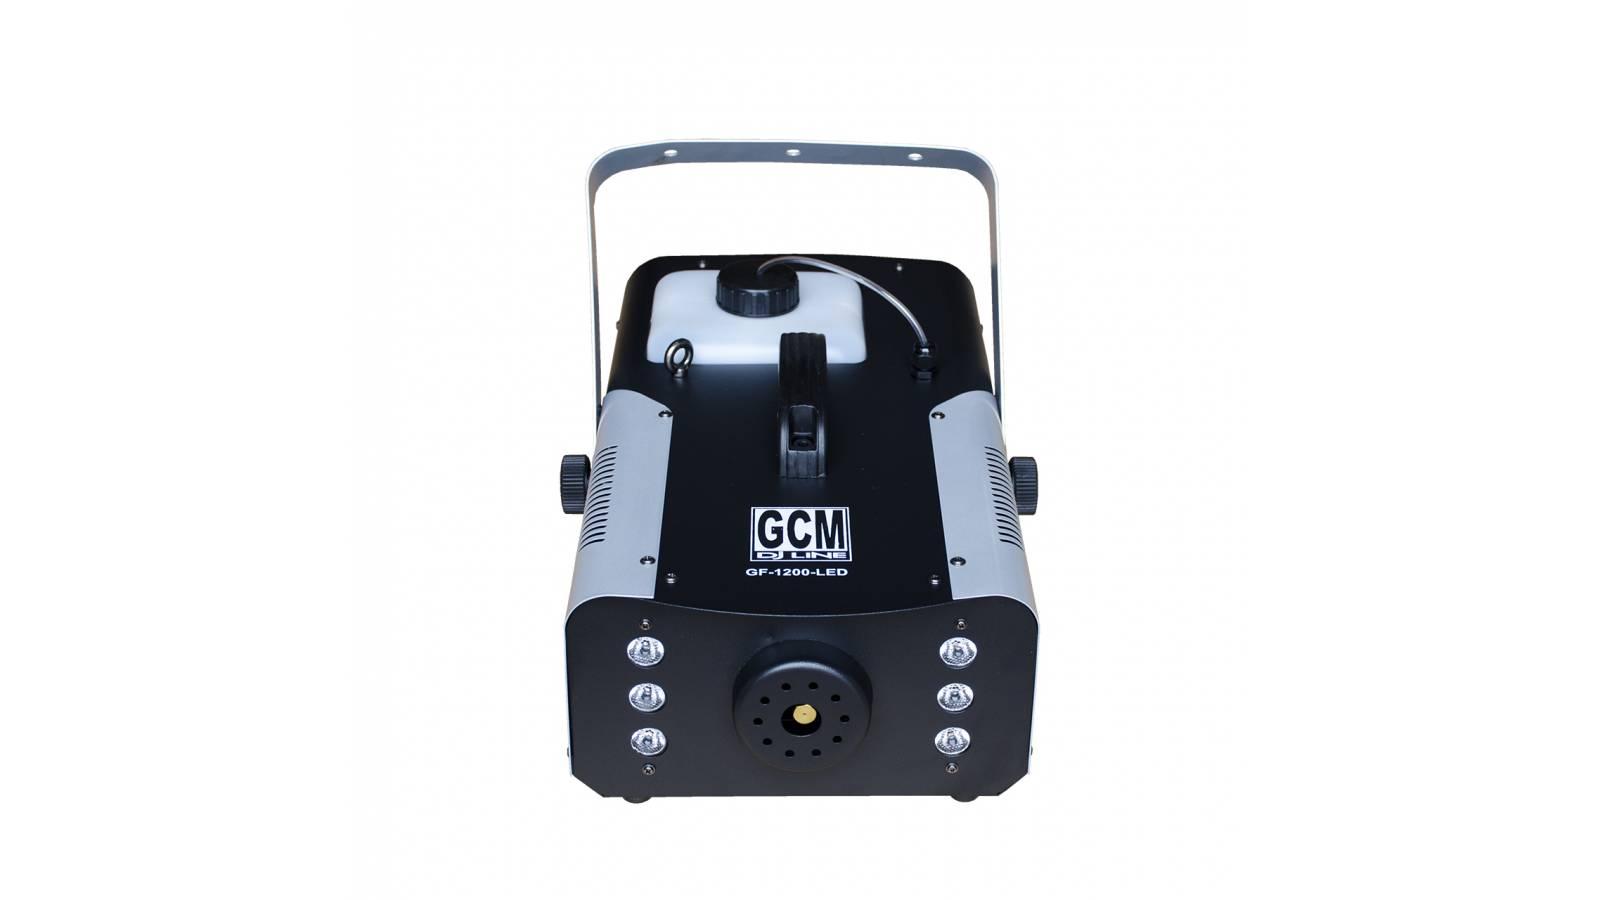 X-TREME Maquina de Humo LED de 1200W GF-1200W-LED + Control Remoto GCM Pro